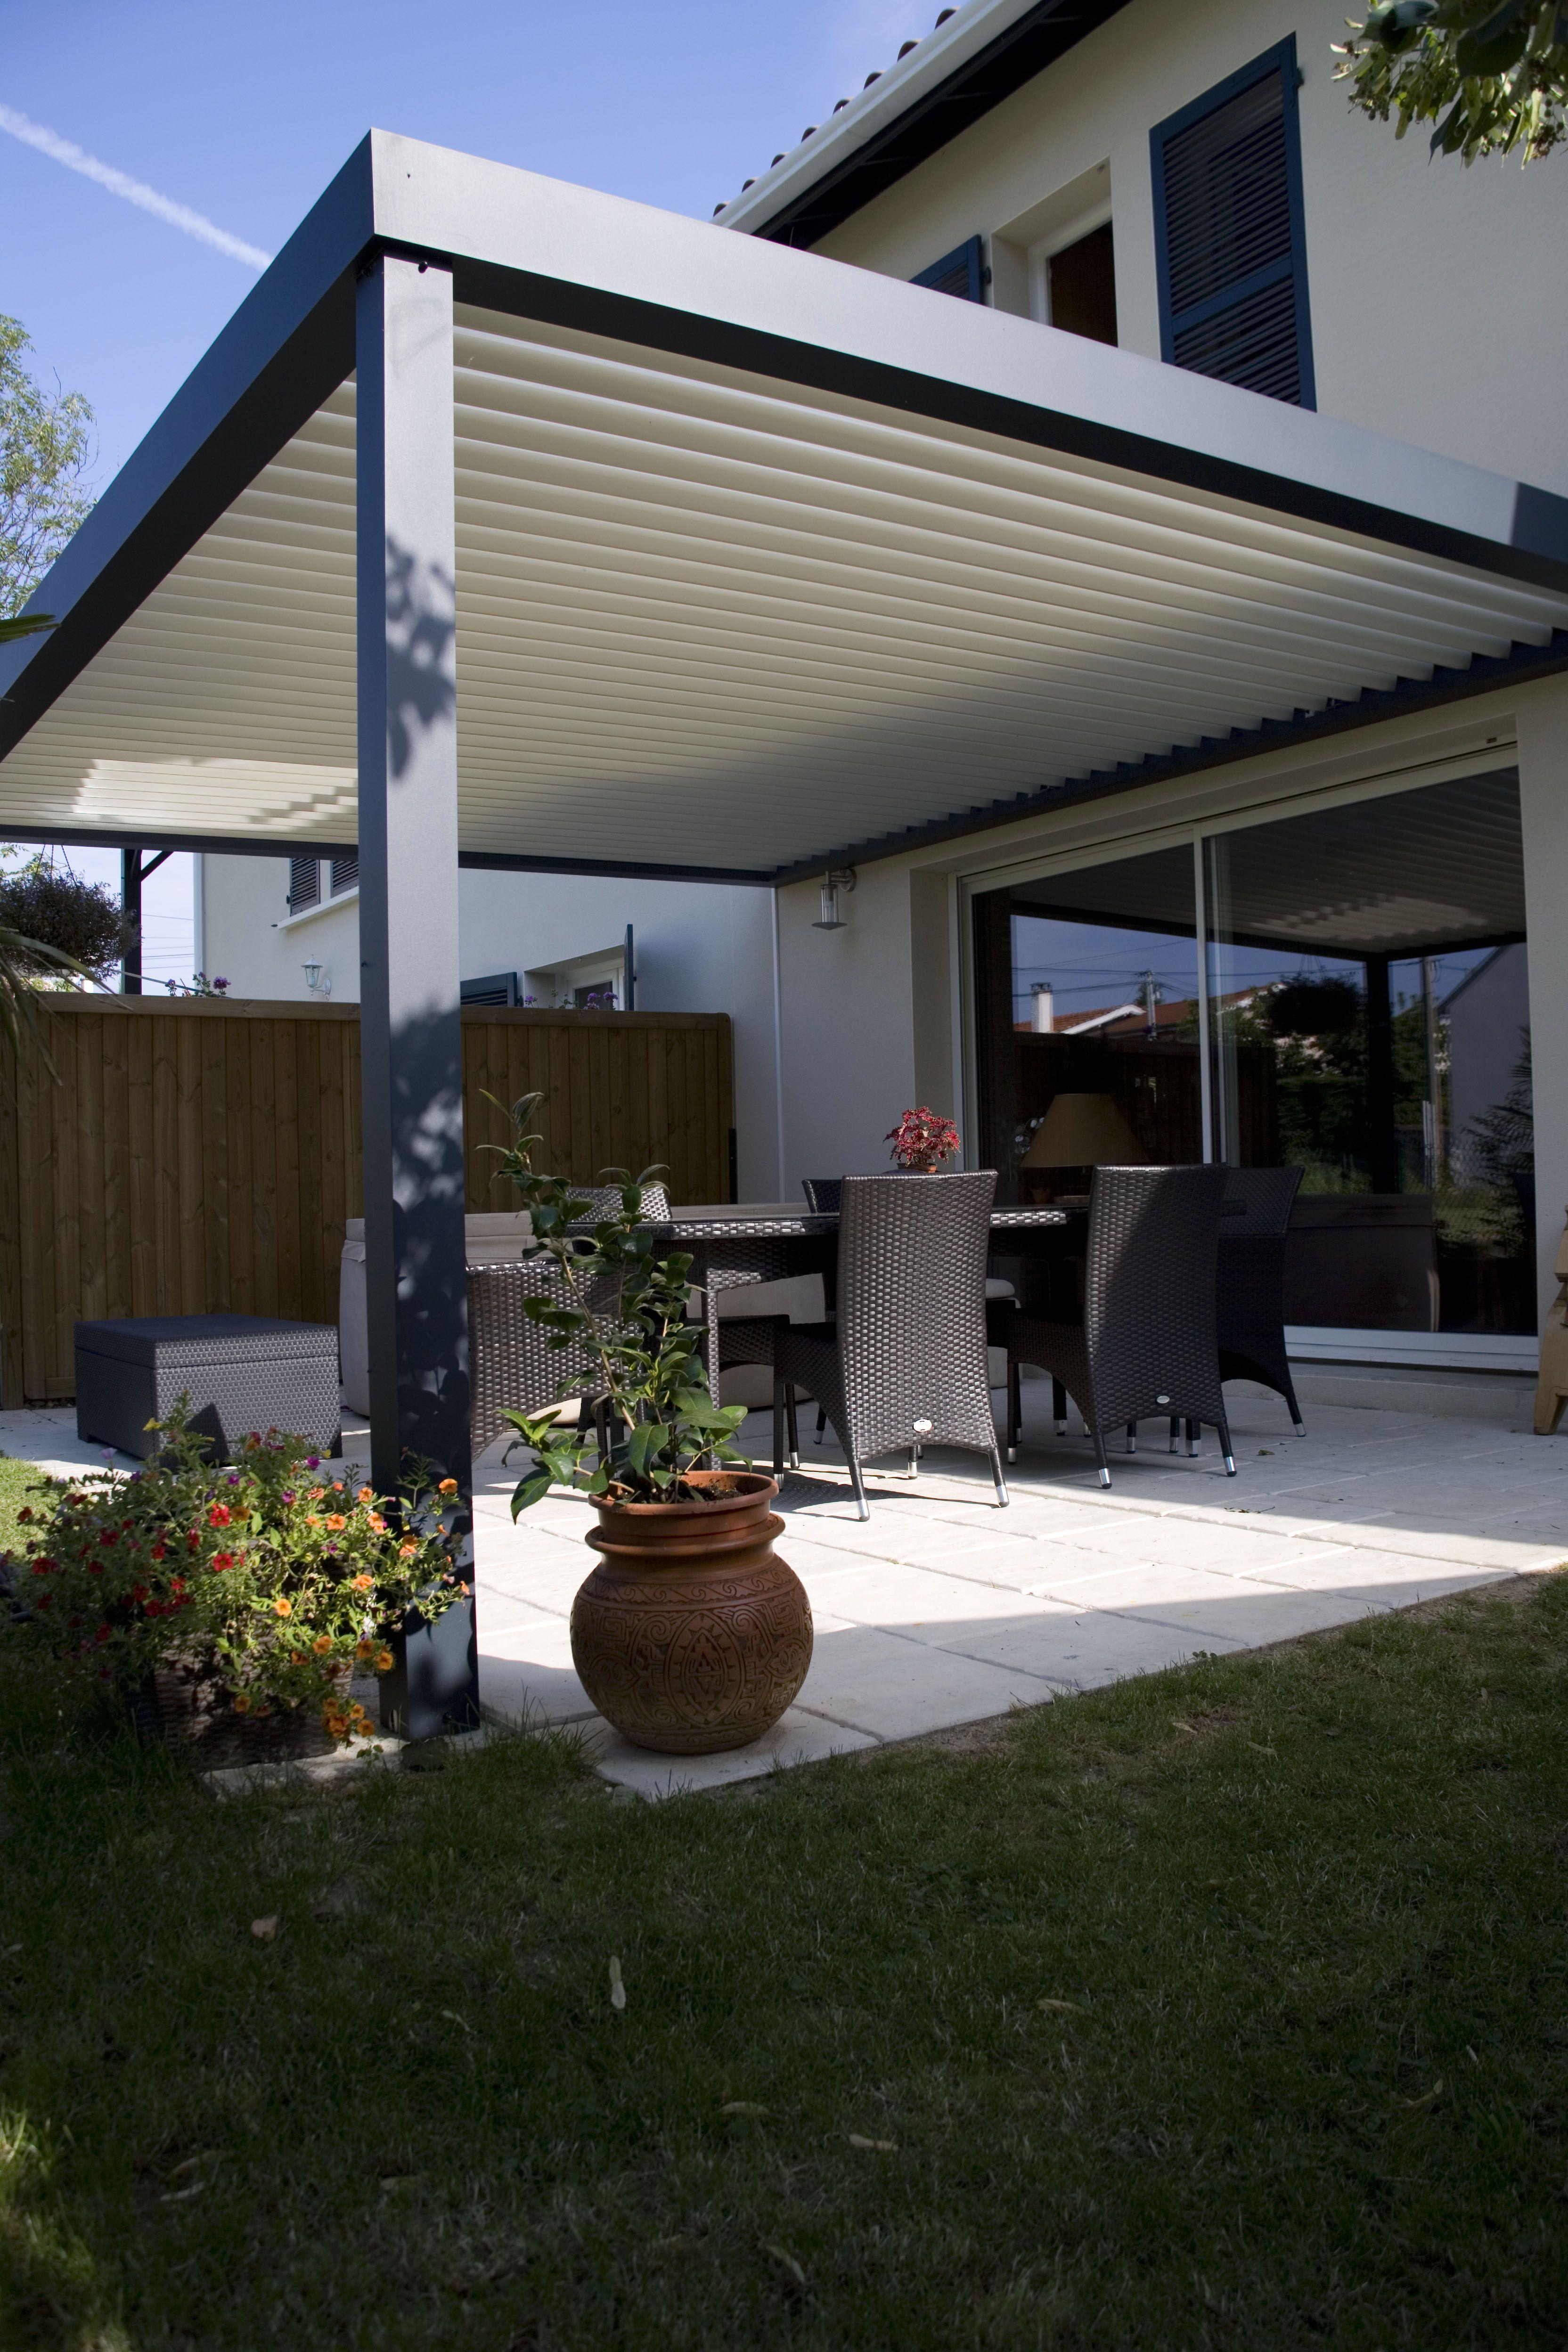 Biossun terrasoverkapping pergola couverture de terrasse | Terraza ...